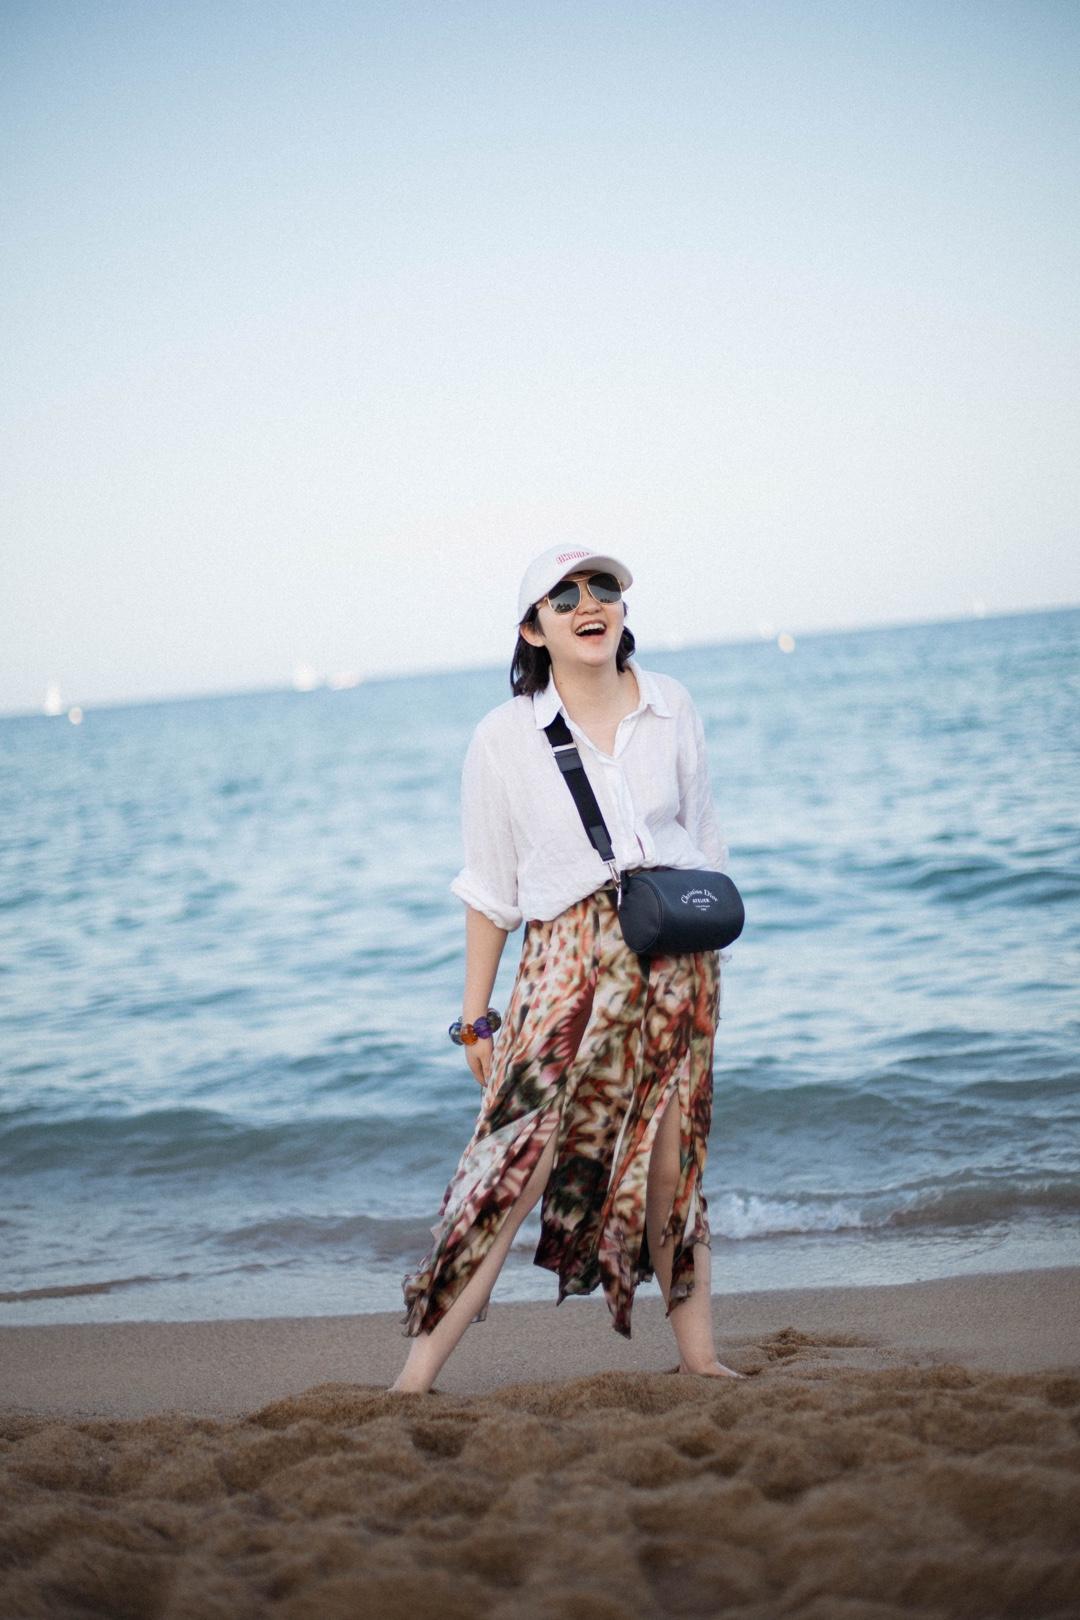 西班牙的海边,白衬衫花裙子的我😳 衬衫:Massimo Dutti 半裙:Chaio Ruiz 包:Christian Dior 手镯:Uterque 墨镜:Alexander Mcqueen